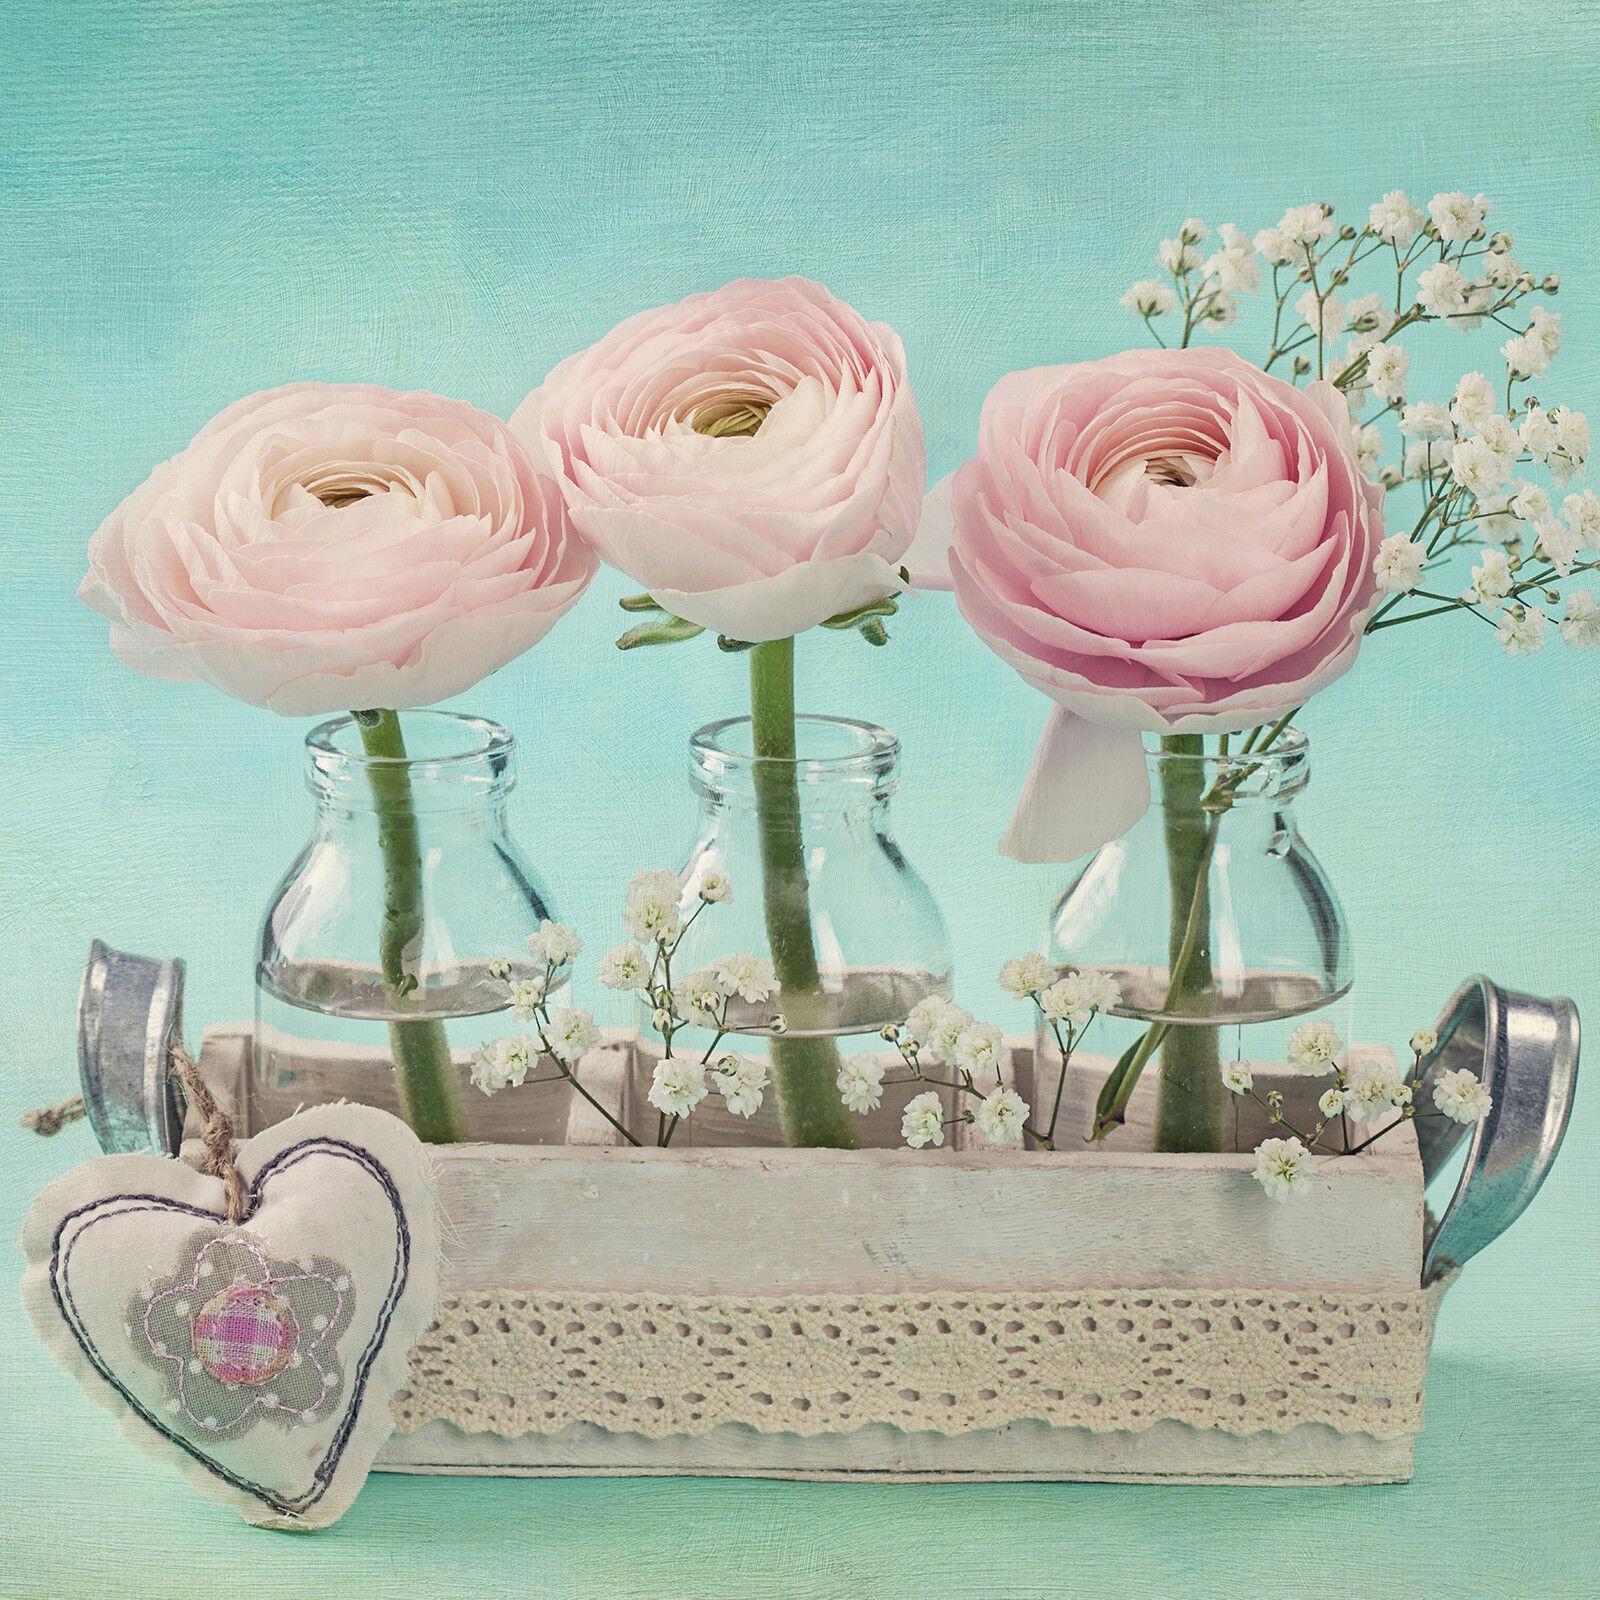 Trempé ESG verre Art Imprimé Photo Wall Art verre Photo Roses Rose Coeur Prizma GWA0332 8e6932